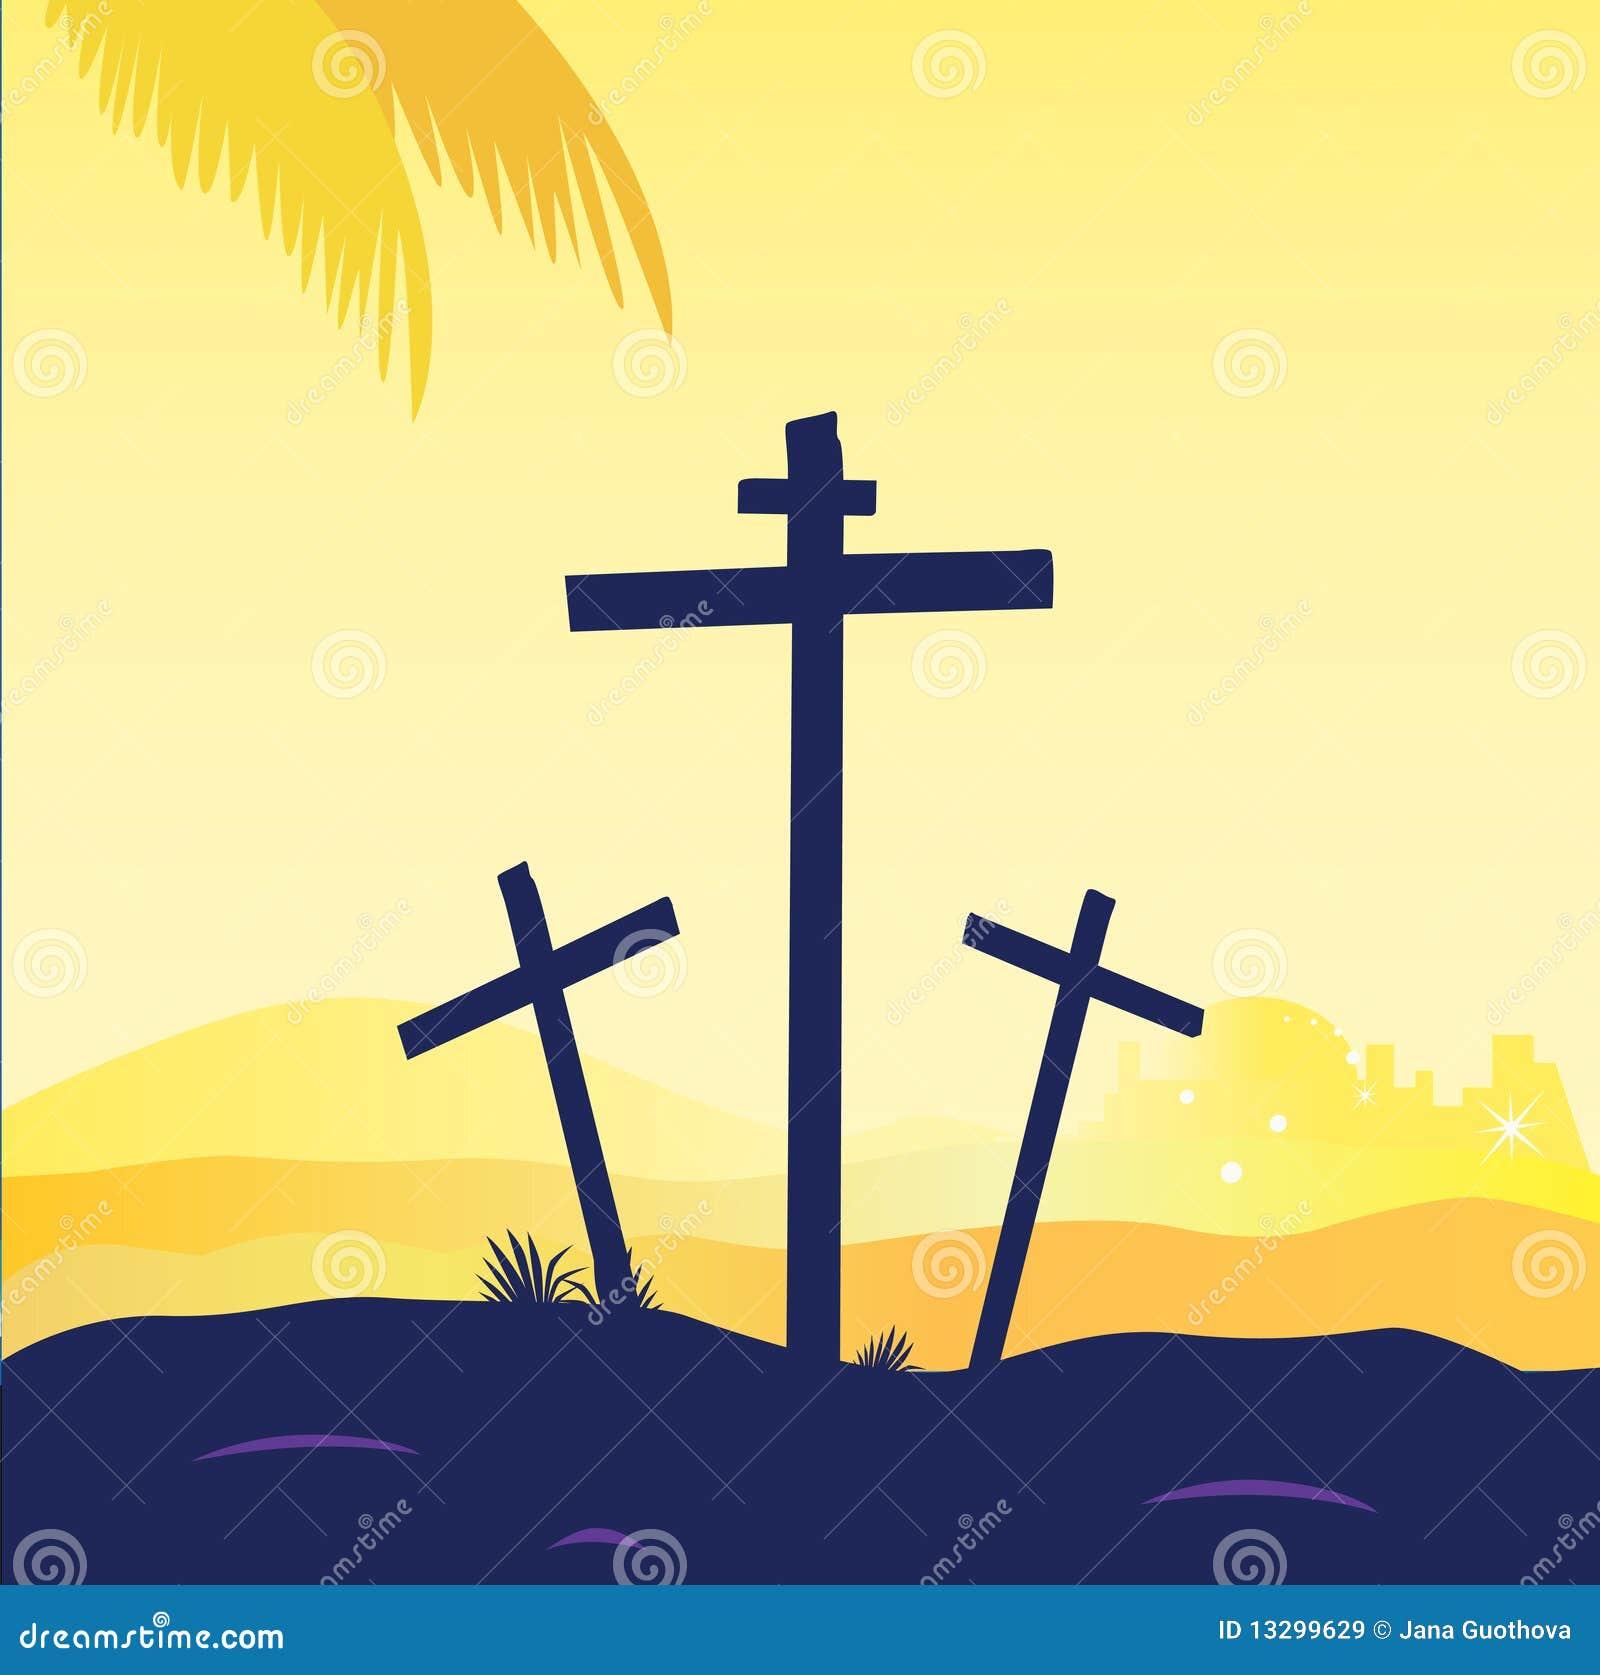 ... sunset scene with crosses. Jesus crucifixion. Vector Illustration